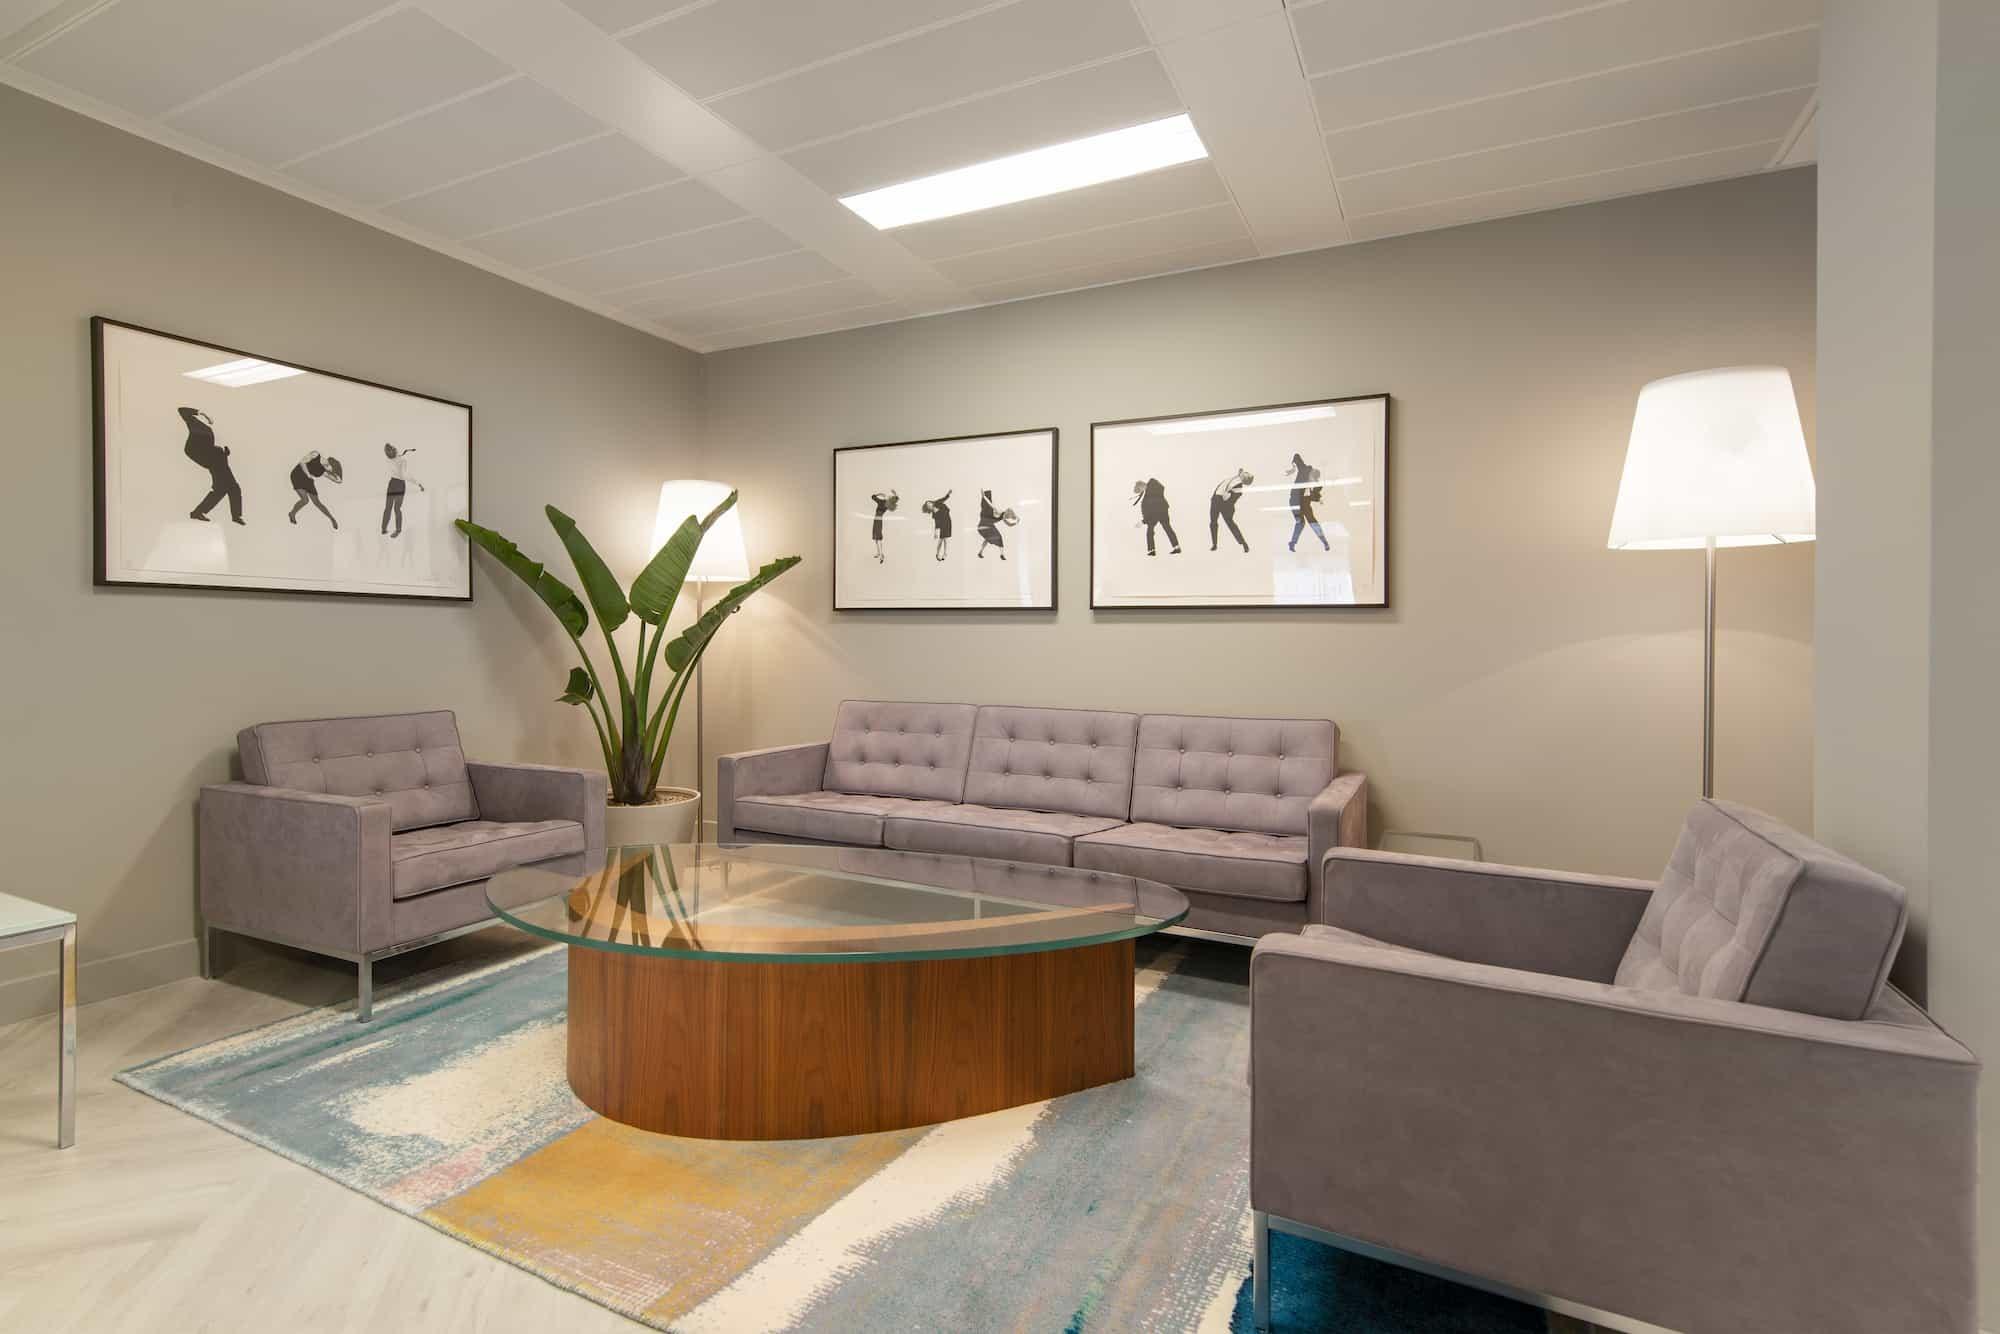 MML reception waiting area design